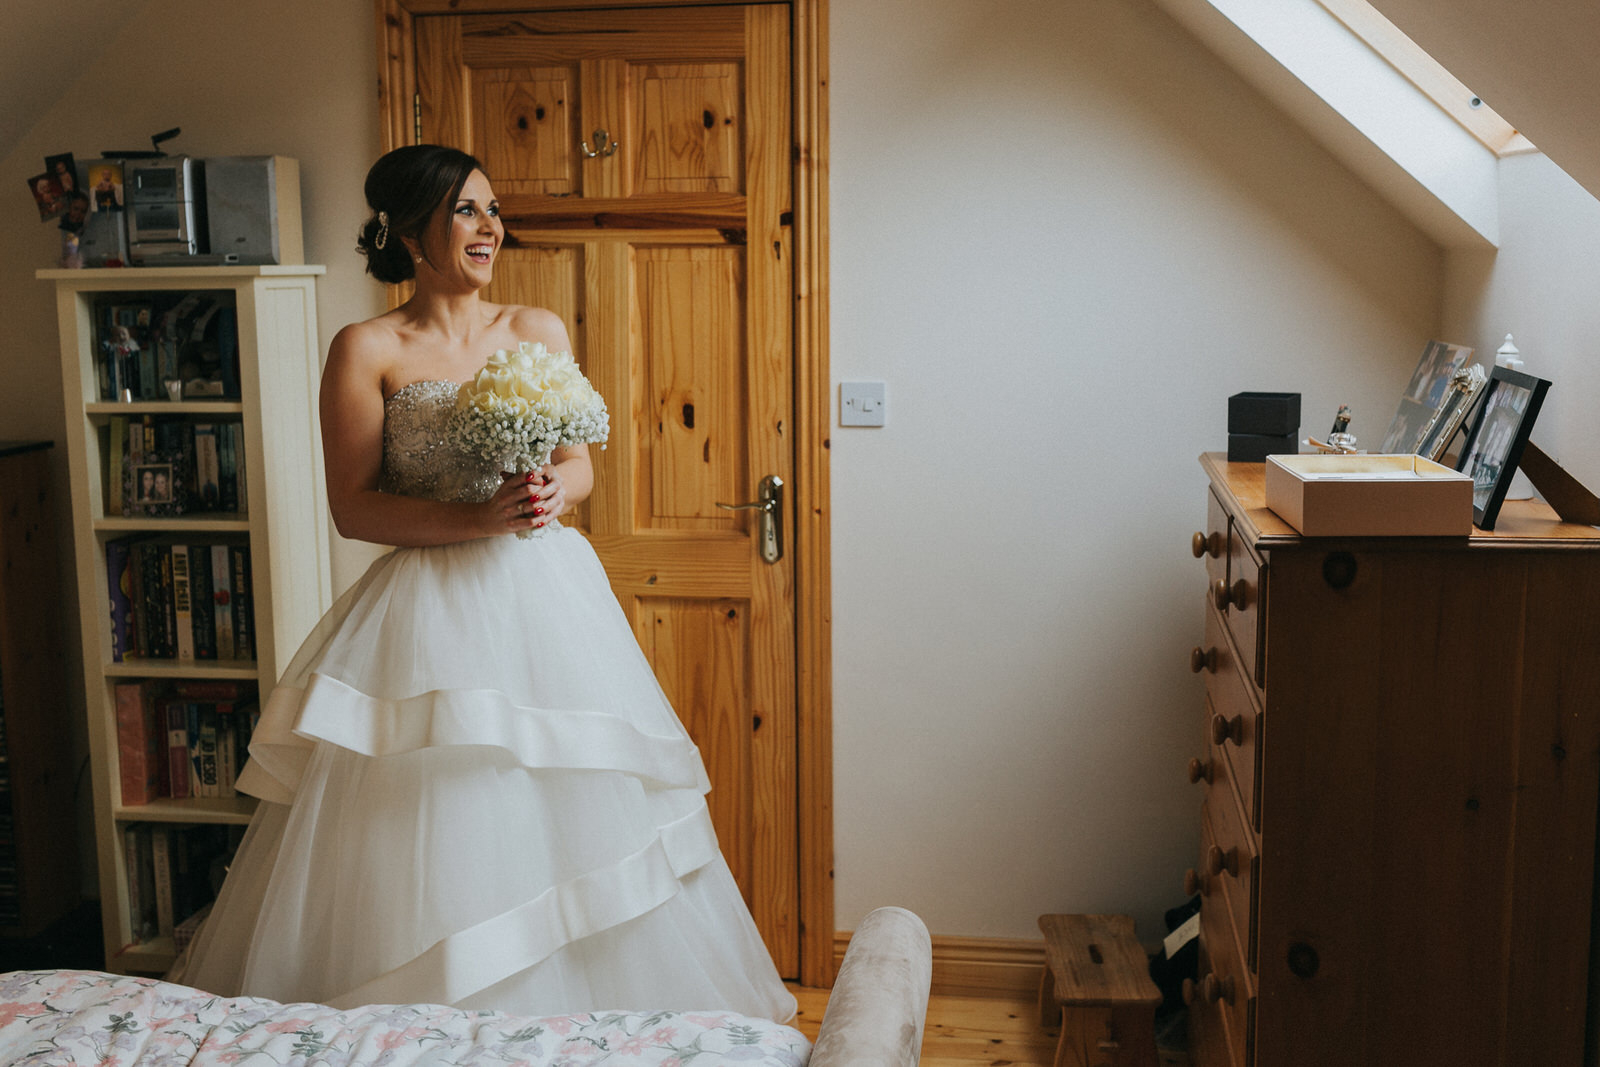 Clonabreany_wedding-photographer_roger_kenny_ireland_019.jpg